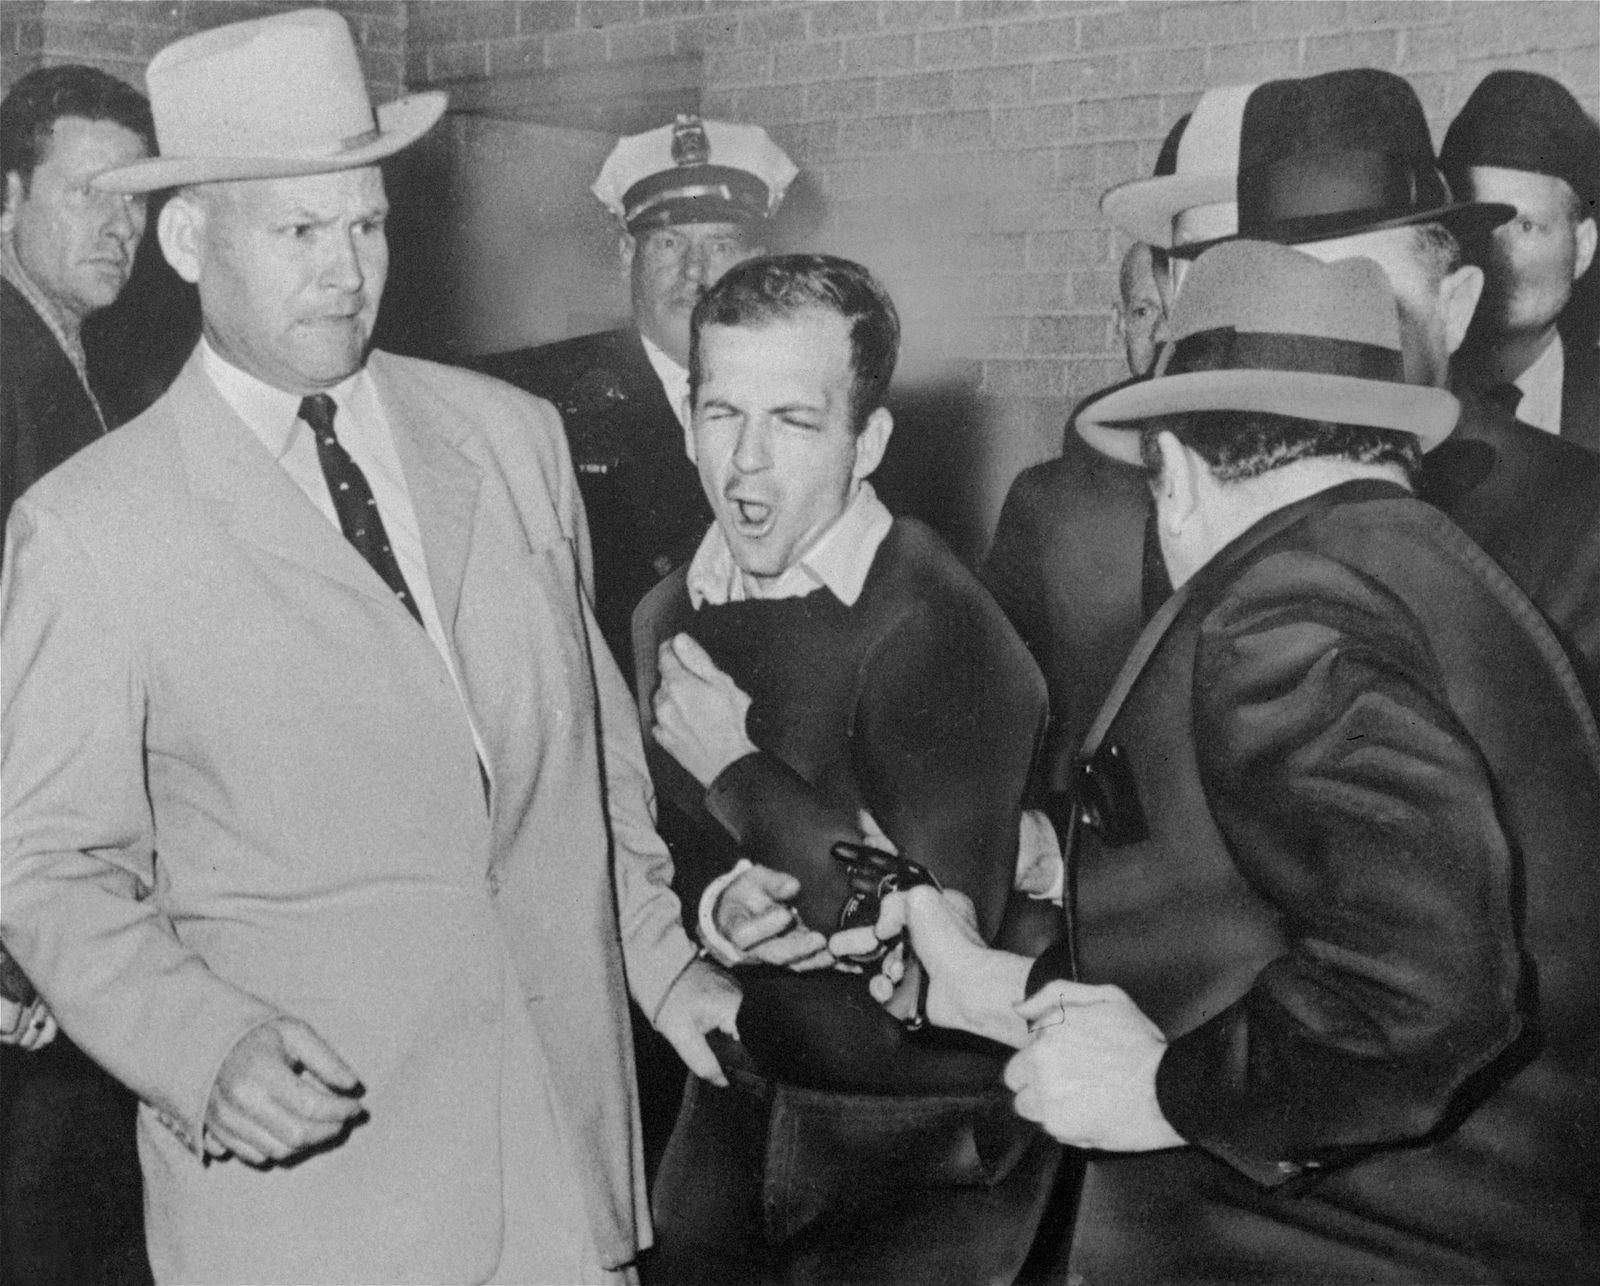 Lee Harvey Oswald / Jack Ruby